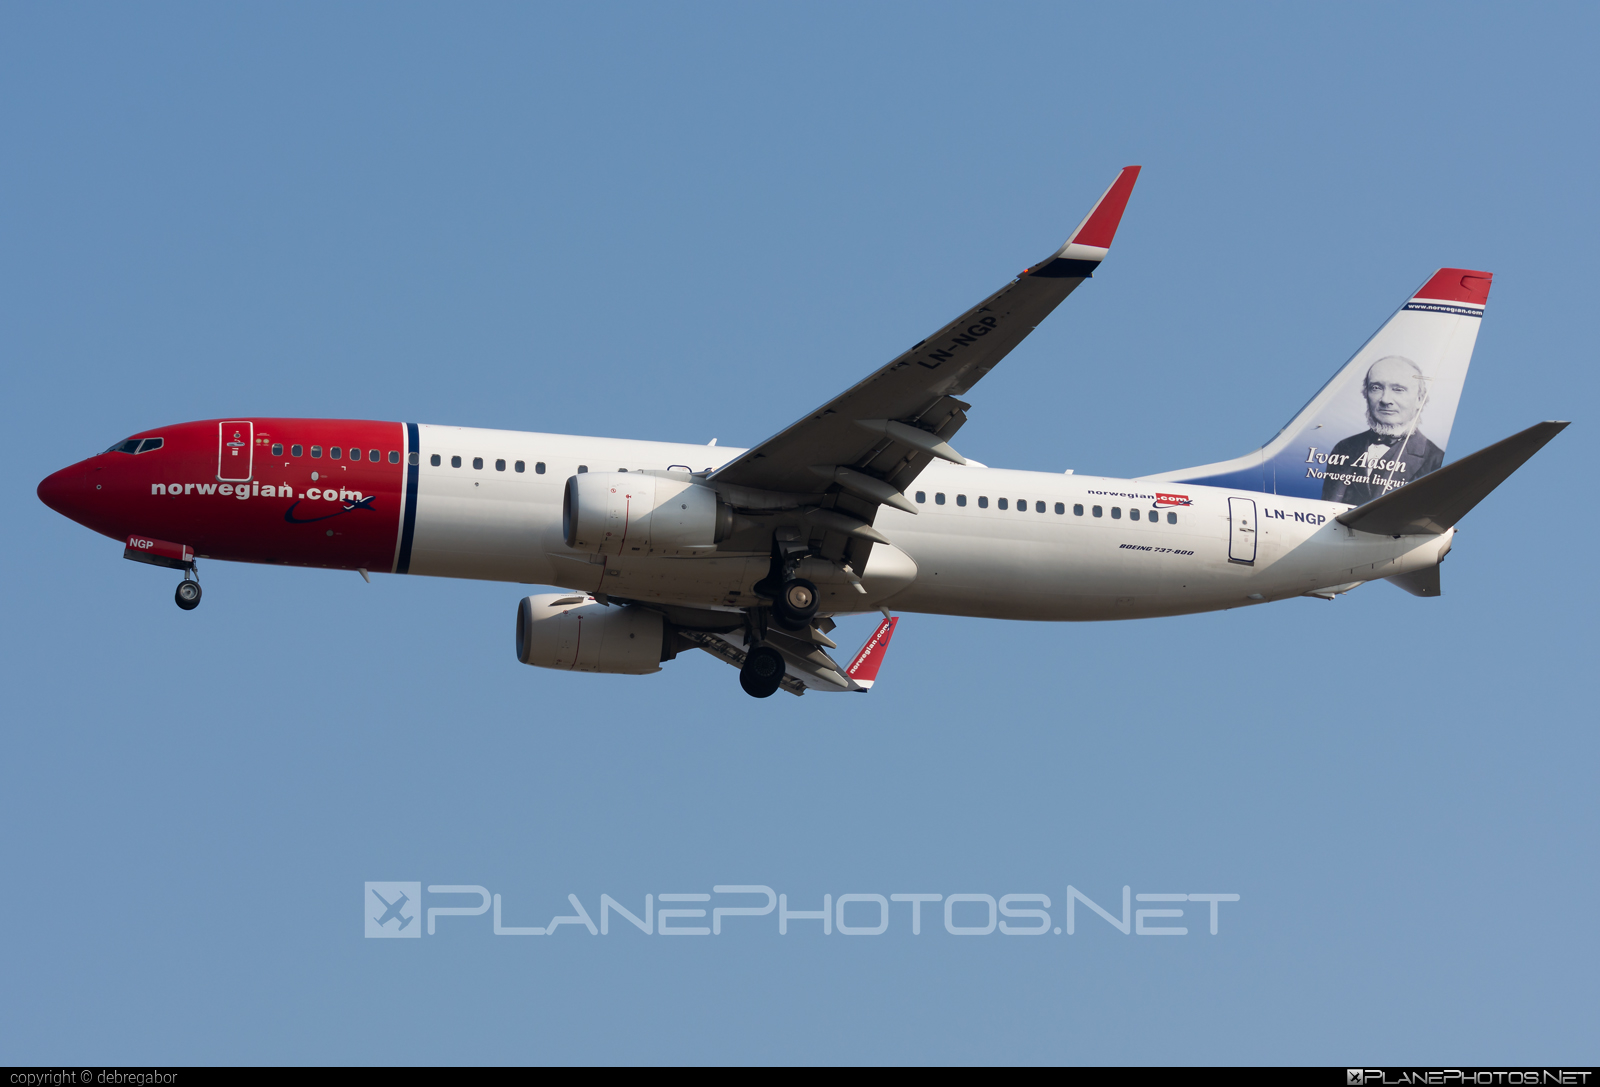 Boeing 737-800 - LN-NGP operated by Norwegian Air Shuttle #b737 #b737nextgen #b737ng #boeing #boeing737 #norwegian #norwegianair #norwegianairshuttle